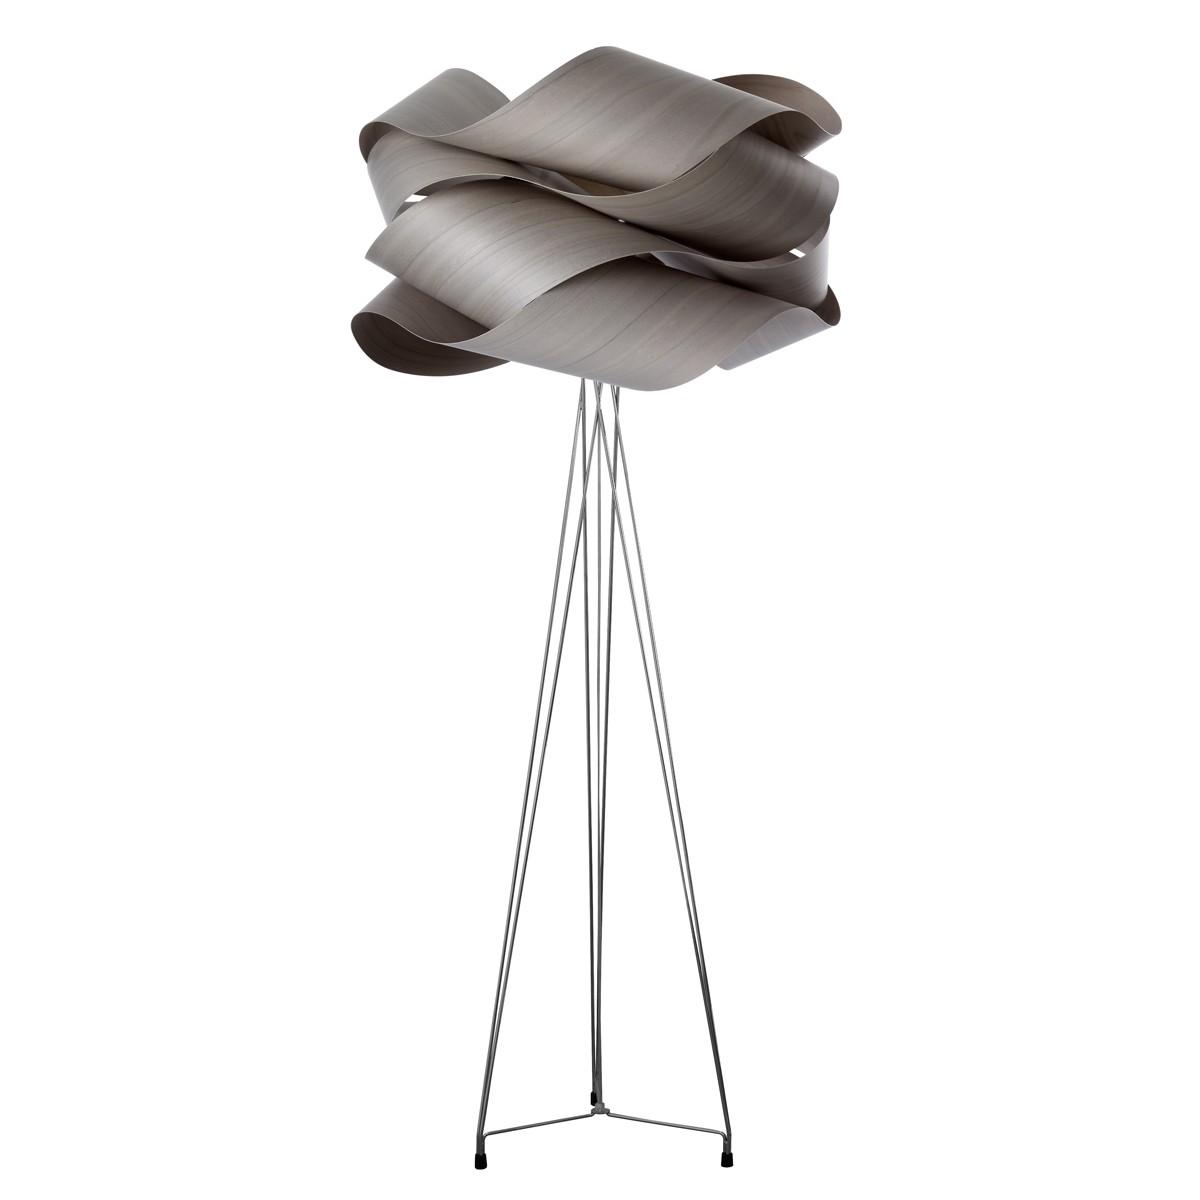 LZF Lamps Link Stehleuchte, Schirm: grau